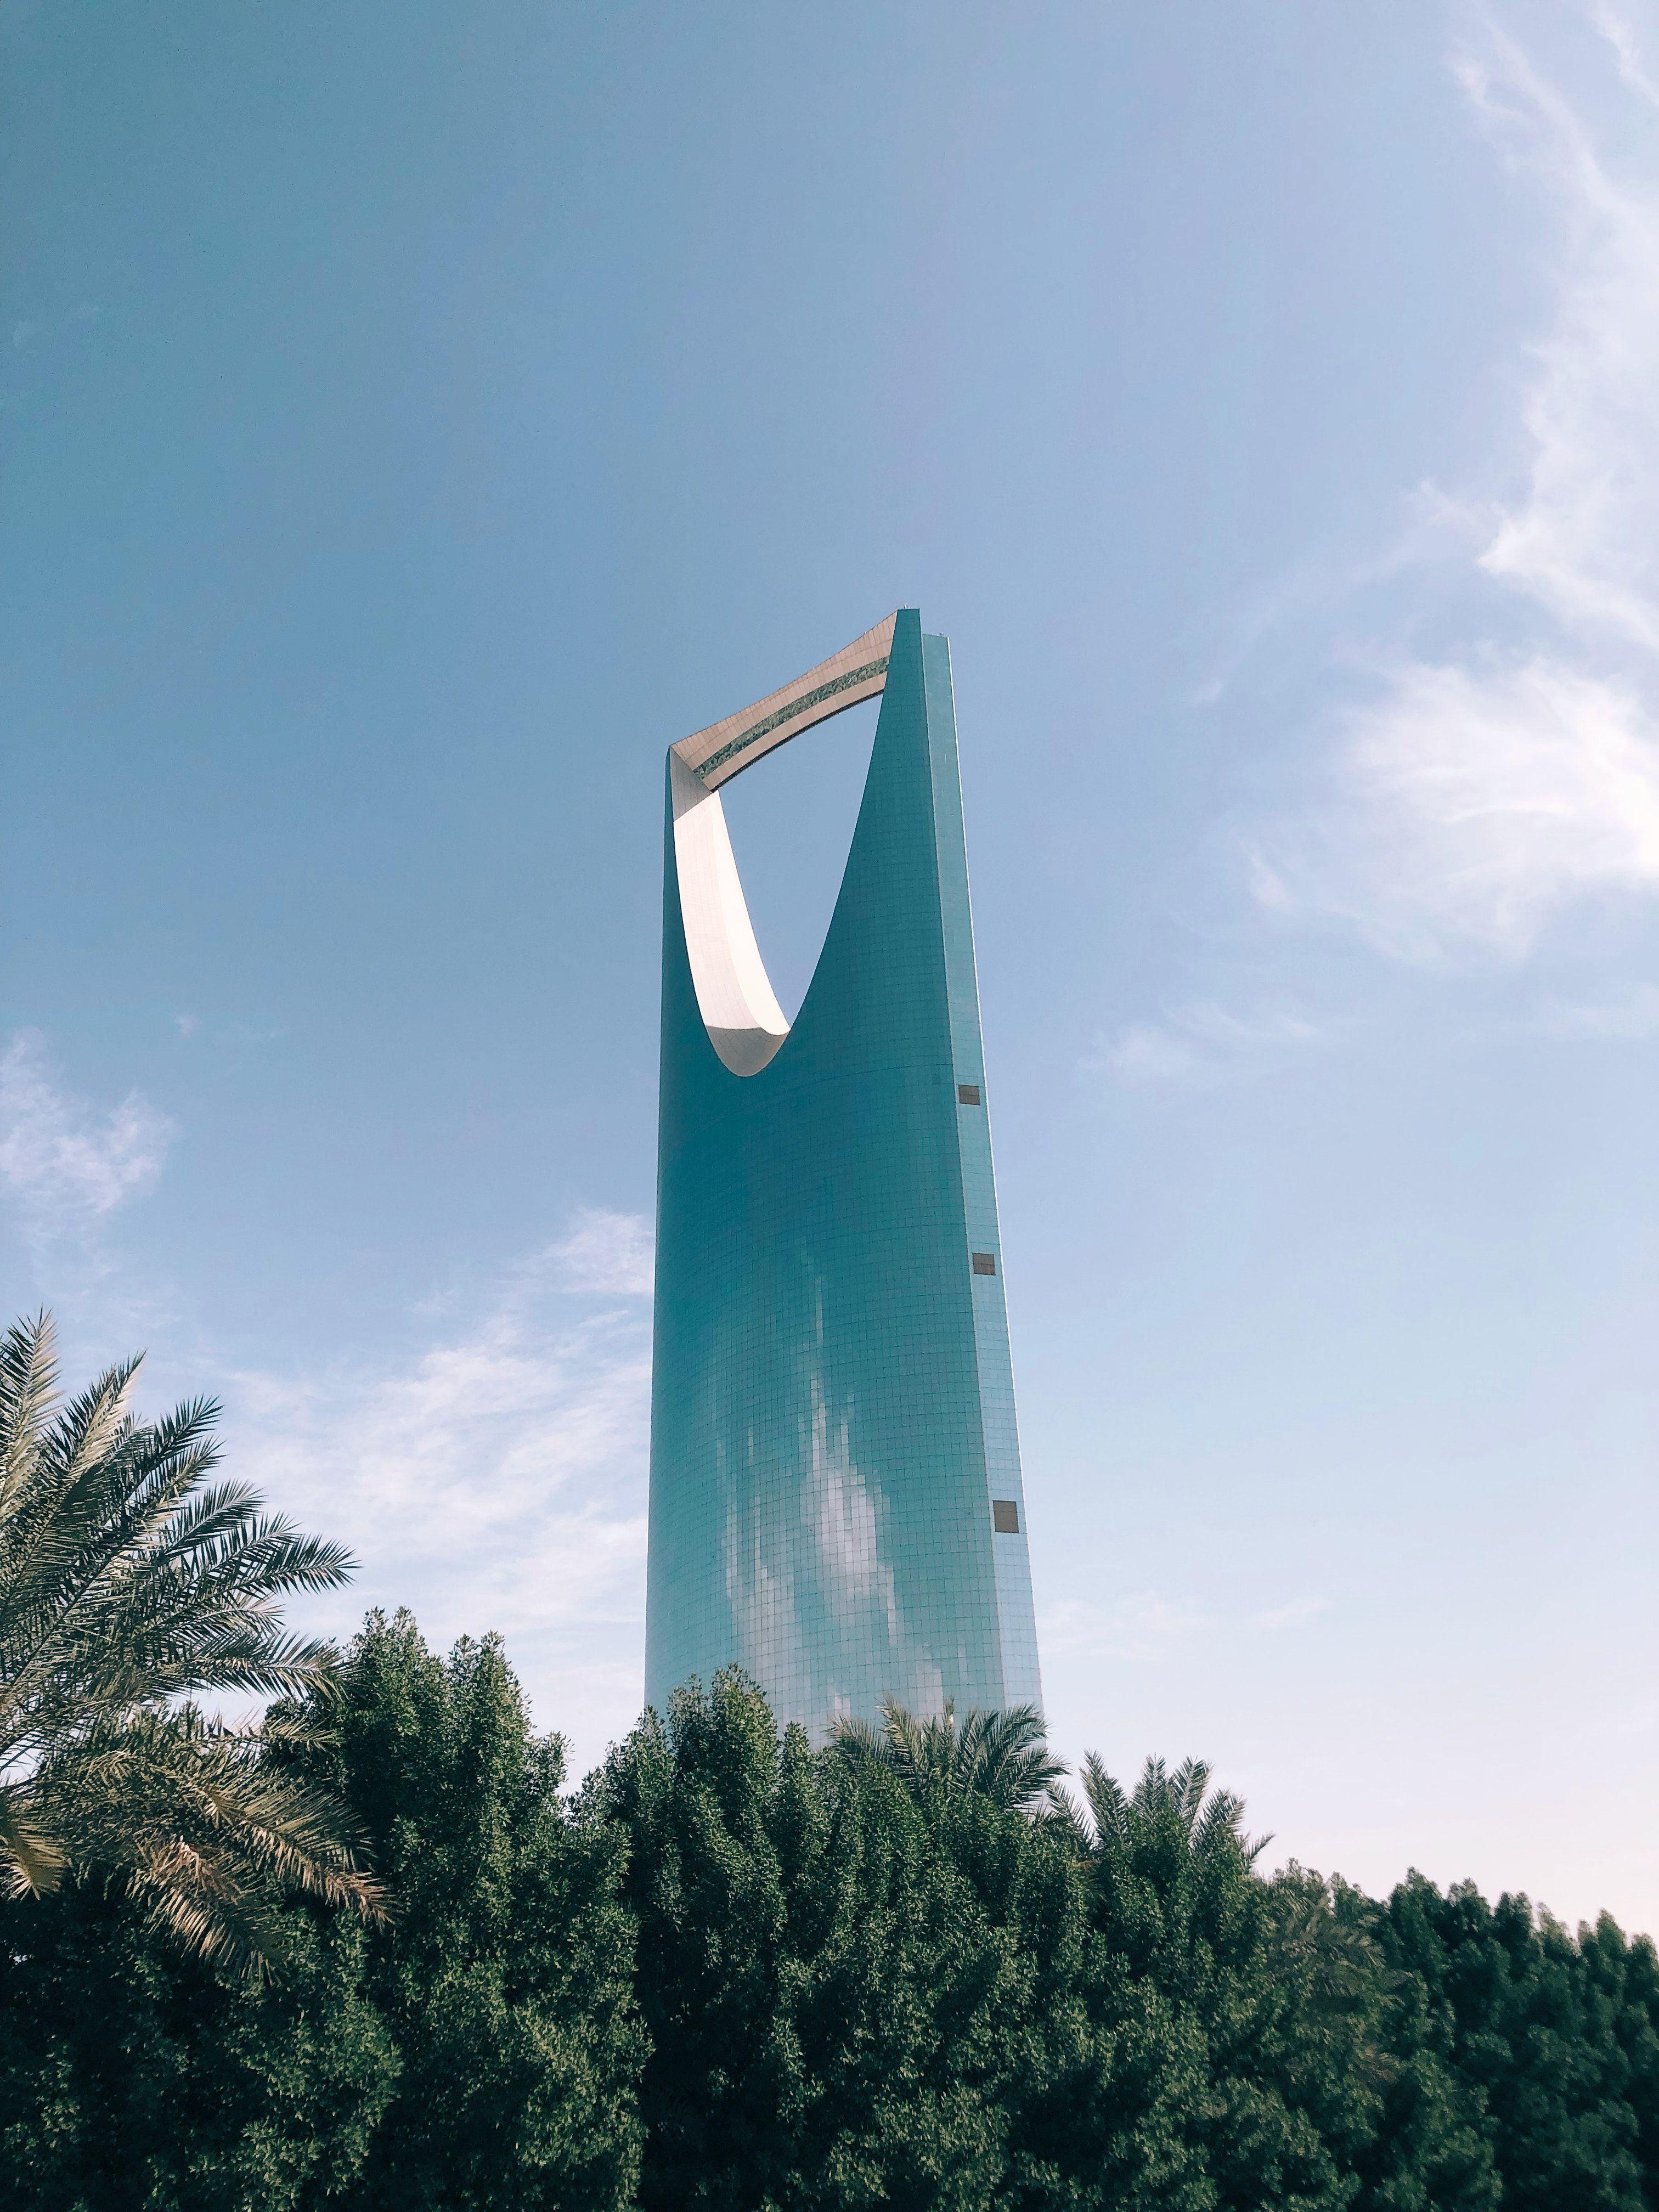 A Stunning Skyscraper In Riyadh Saudi Arabia In 2020 Architecture Building Architecture Architecture Background